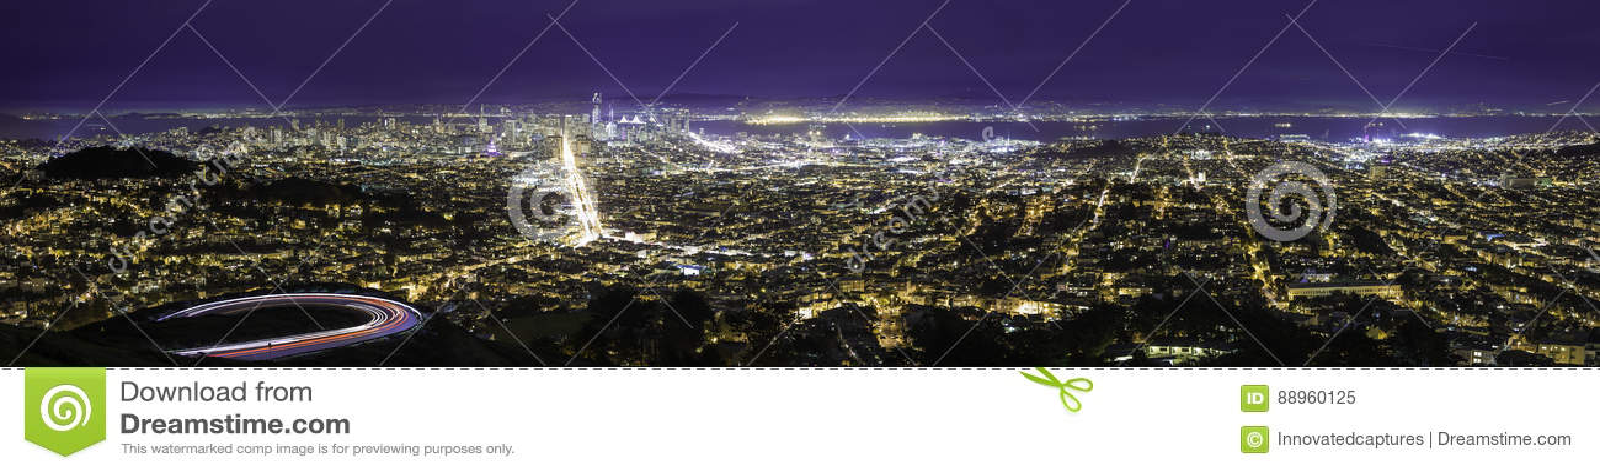 Arquitetura da cidade de San Francisco e de Oakland